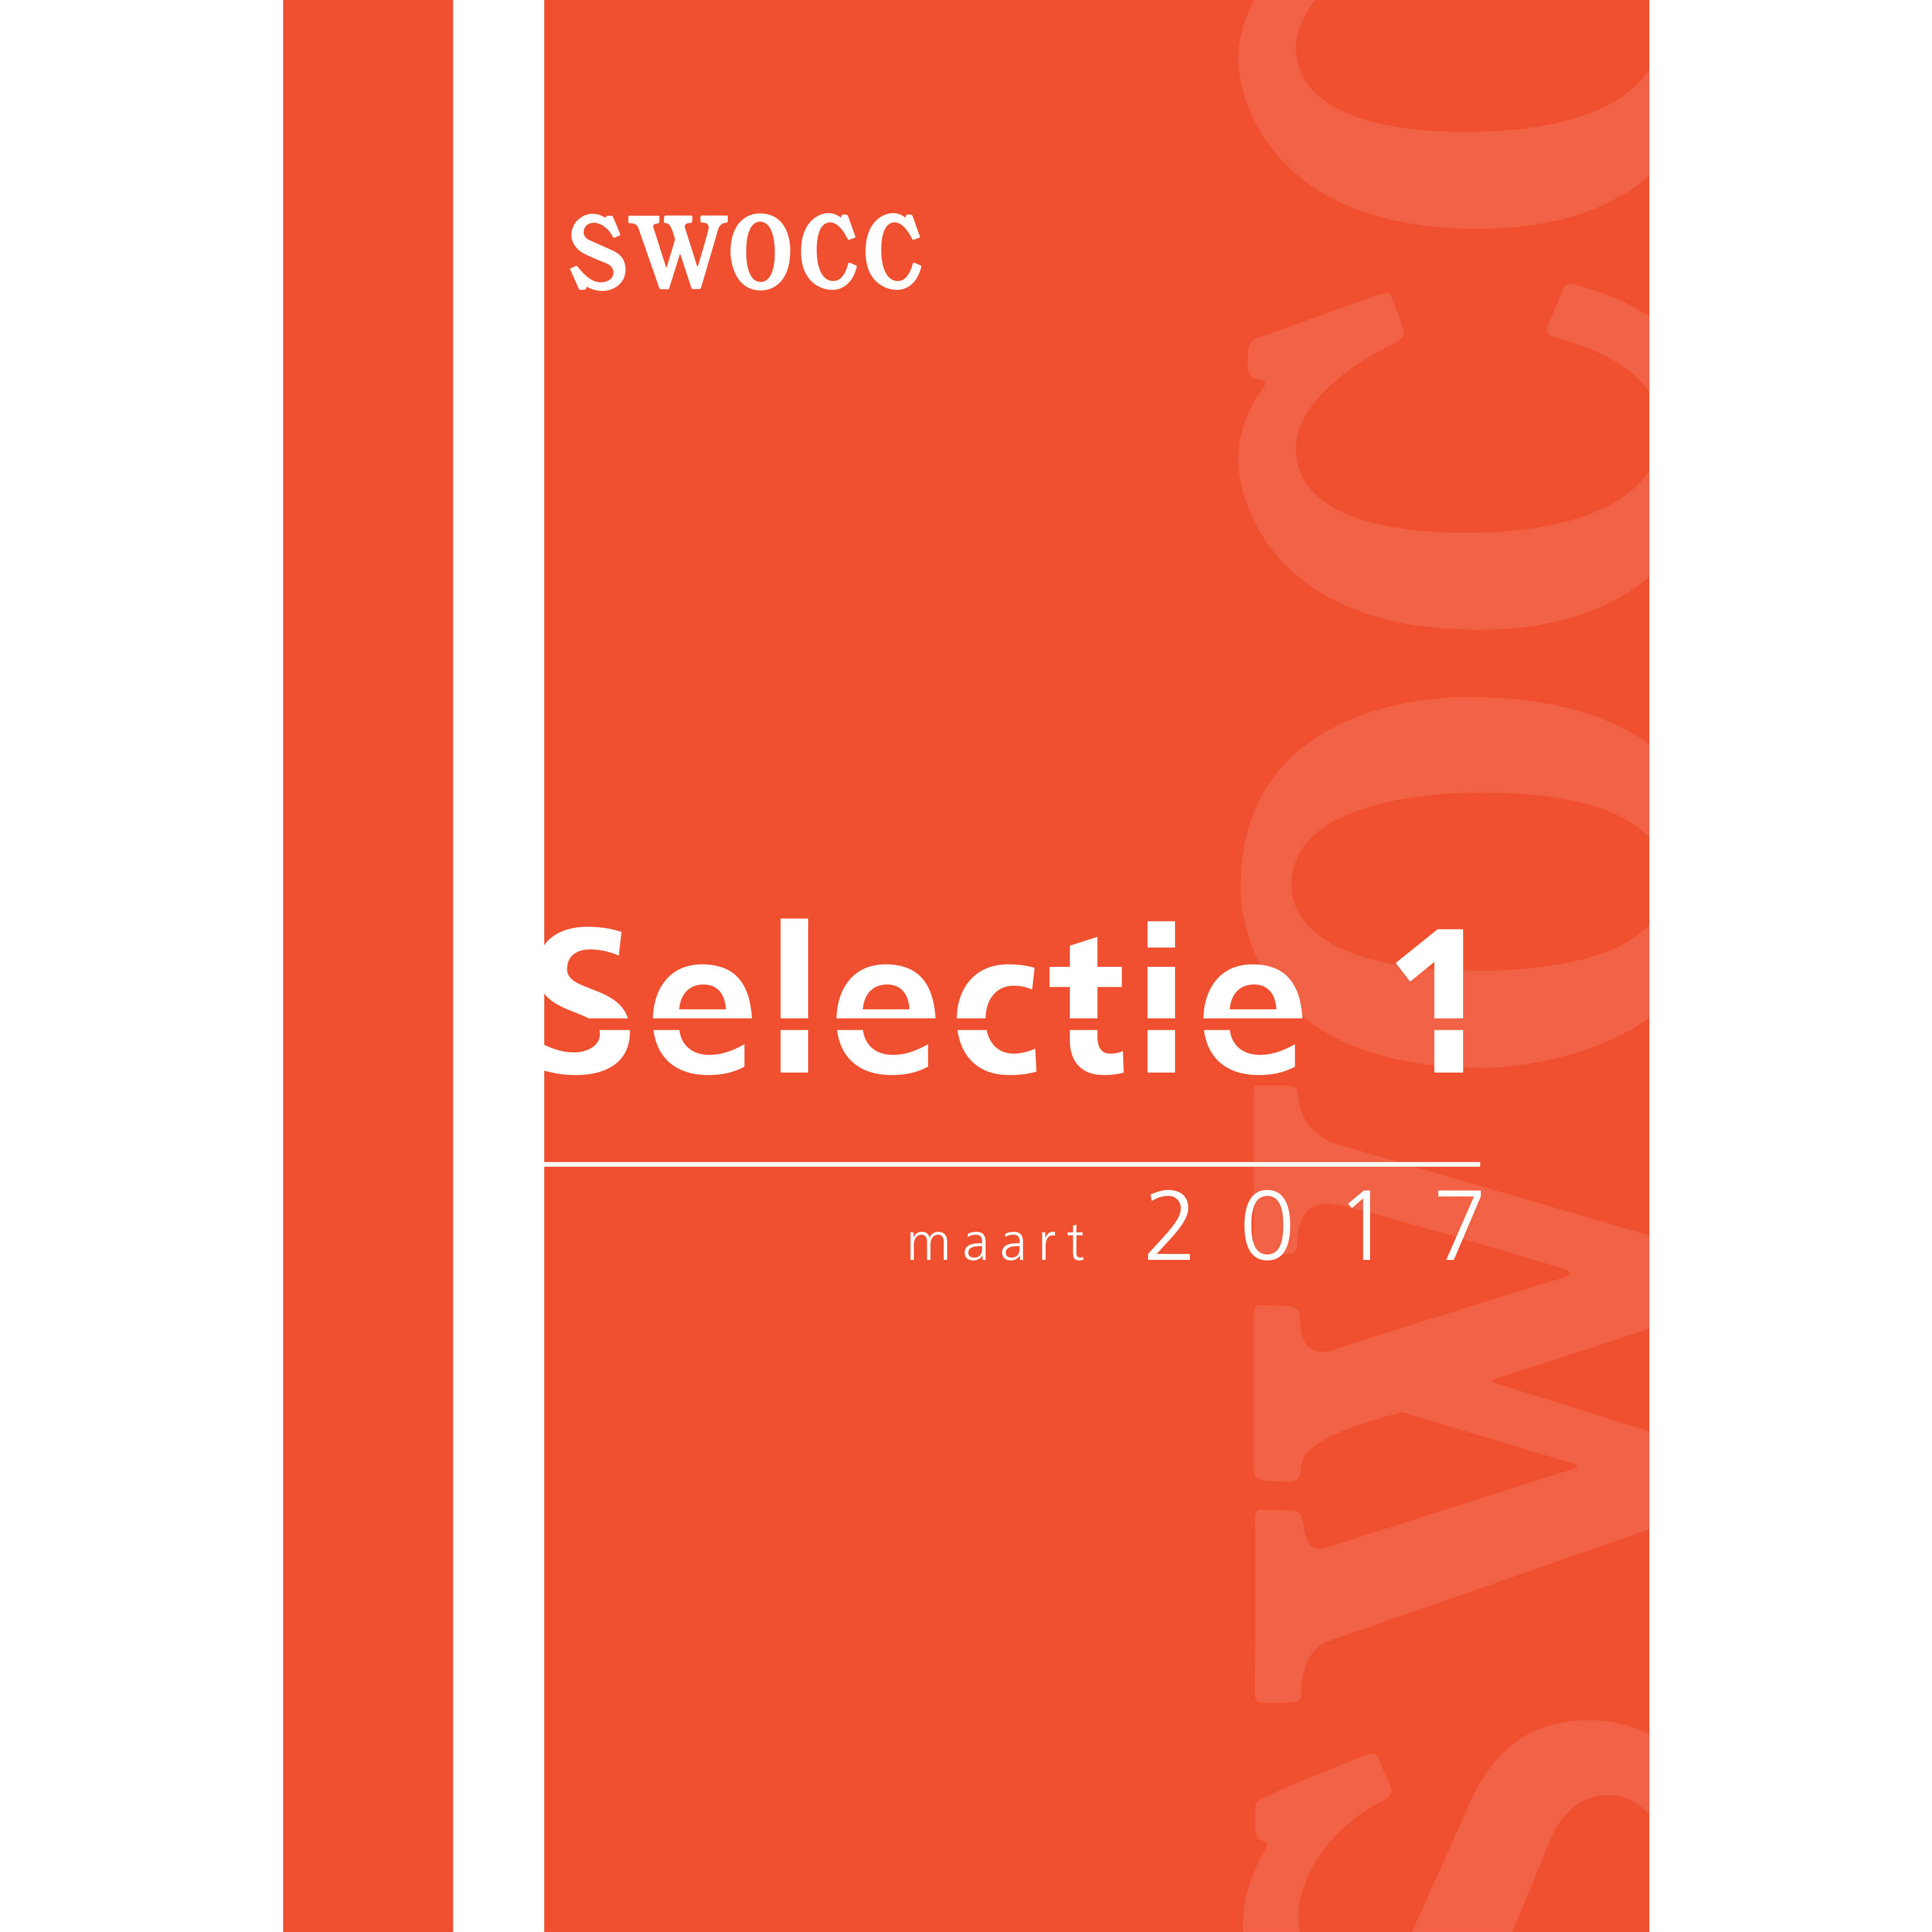 Cover SWOCC Selectie 1 2017 vk